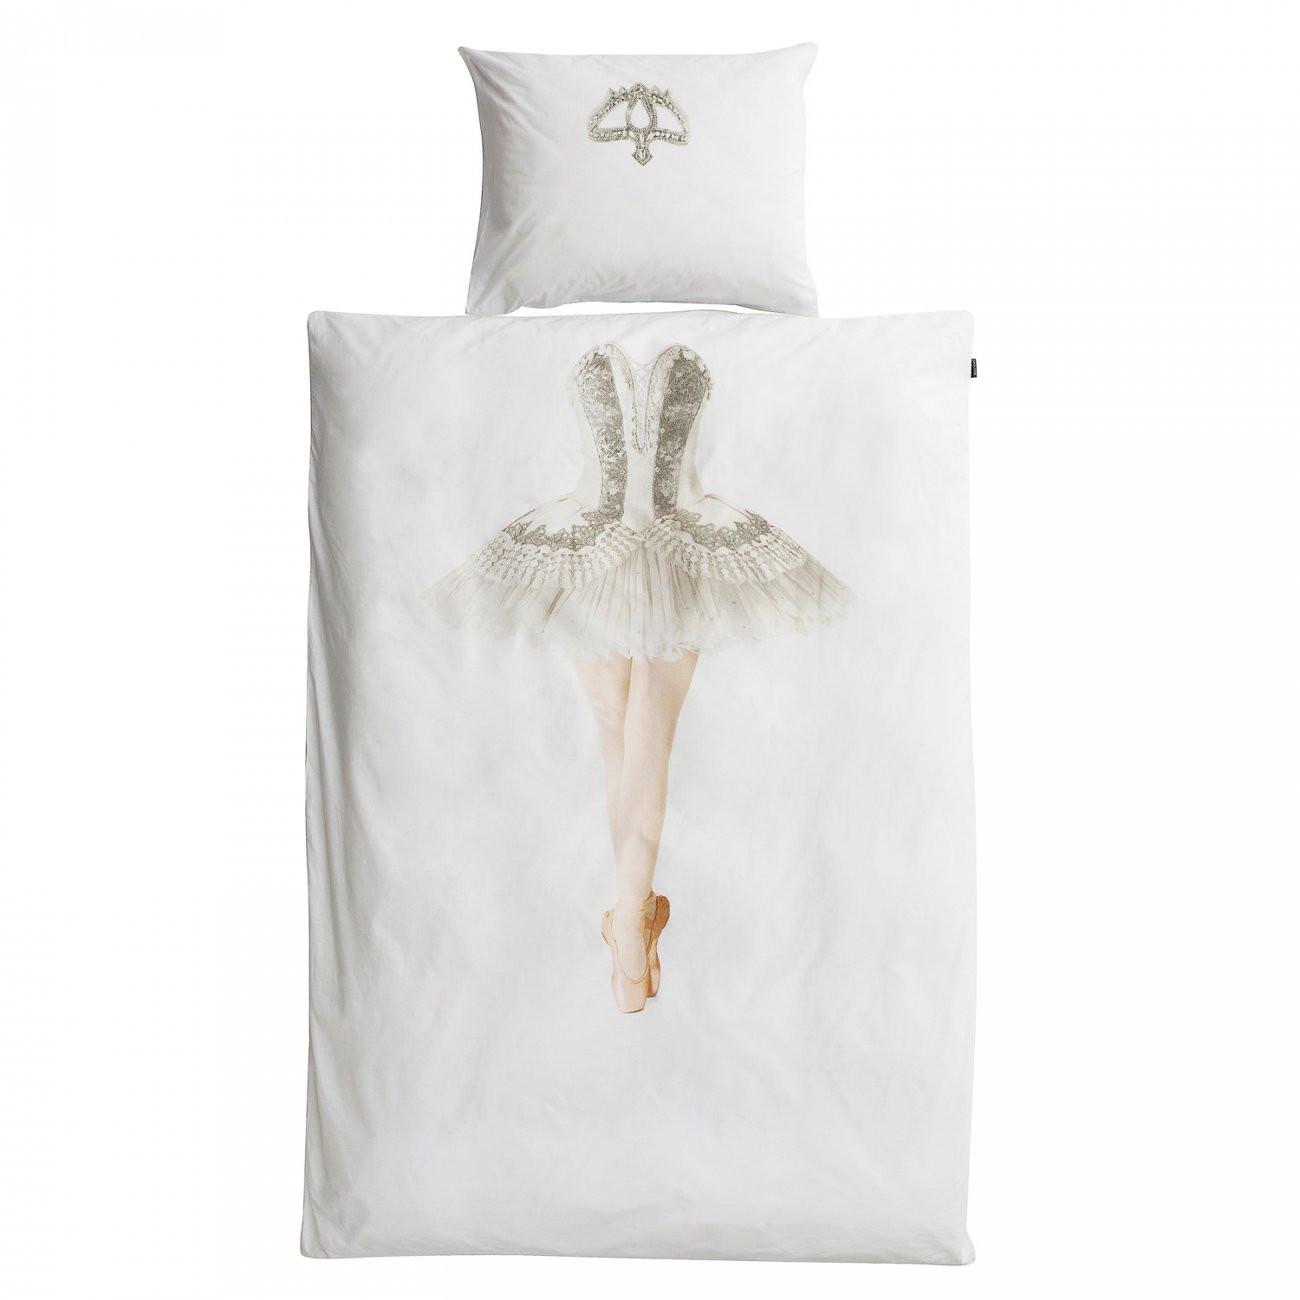 Ballerina Bettdecke | 120 x 150 cm